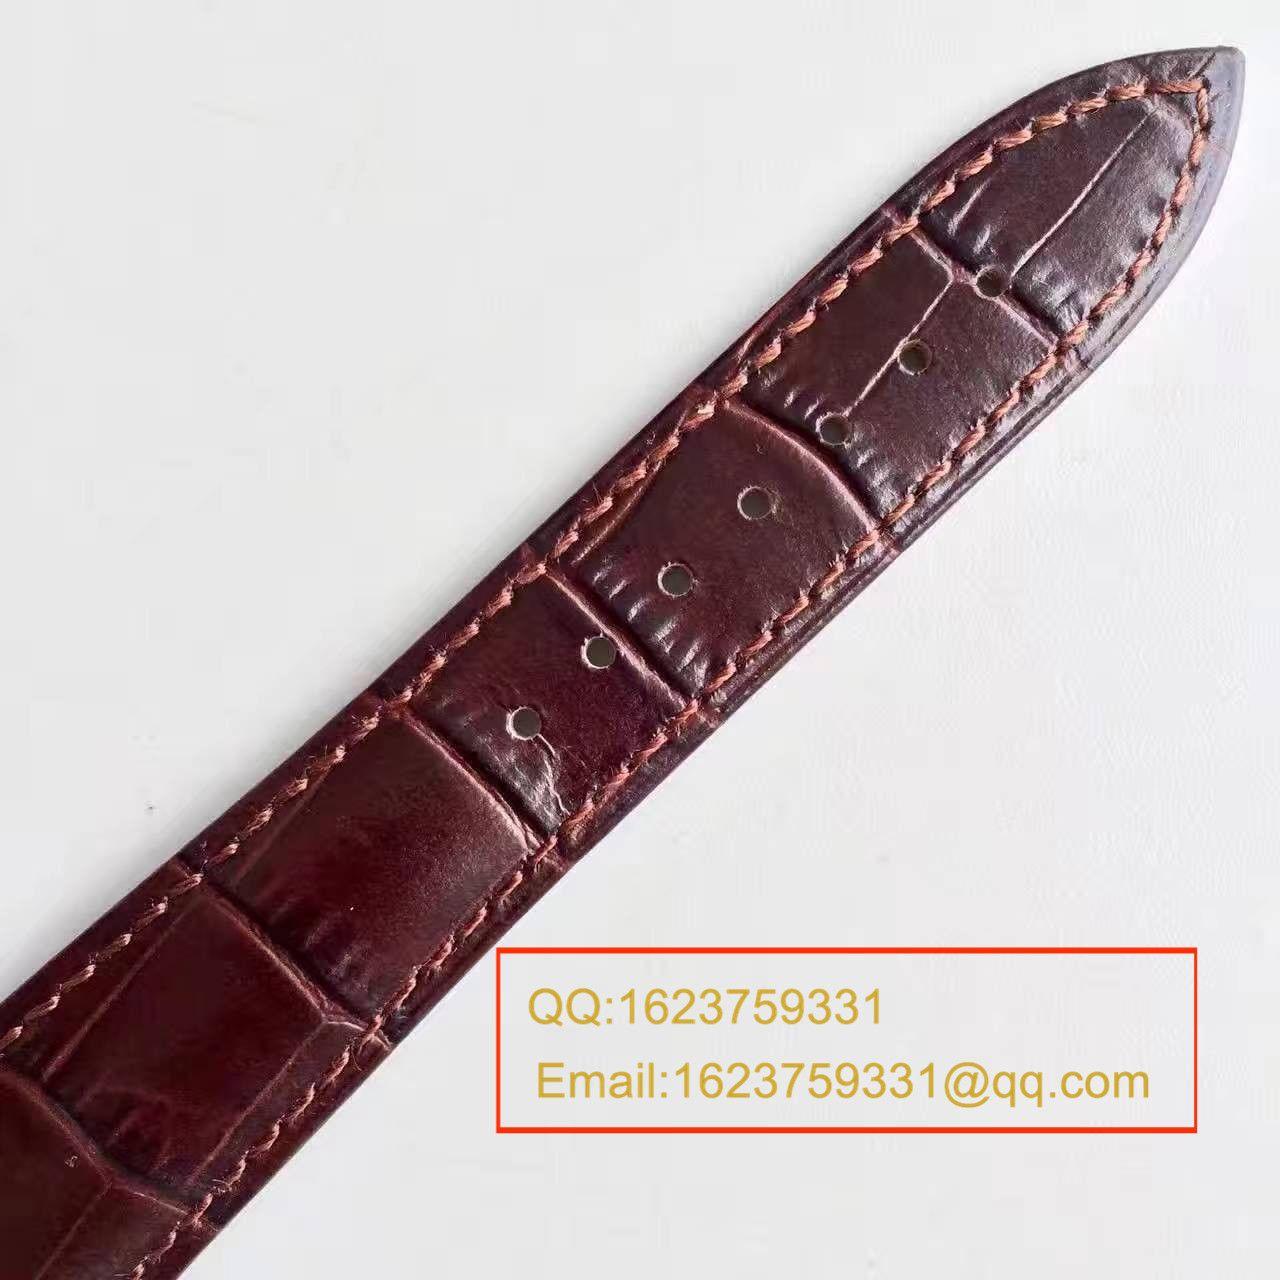 【LH厂一比一超A高仿手表】积家Master超薄大师系列Q1322410自动陀飞轮腕表 / JJ077